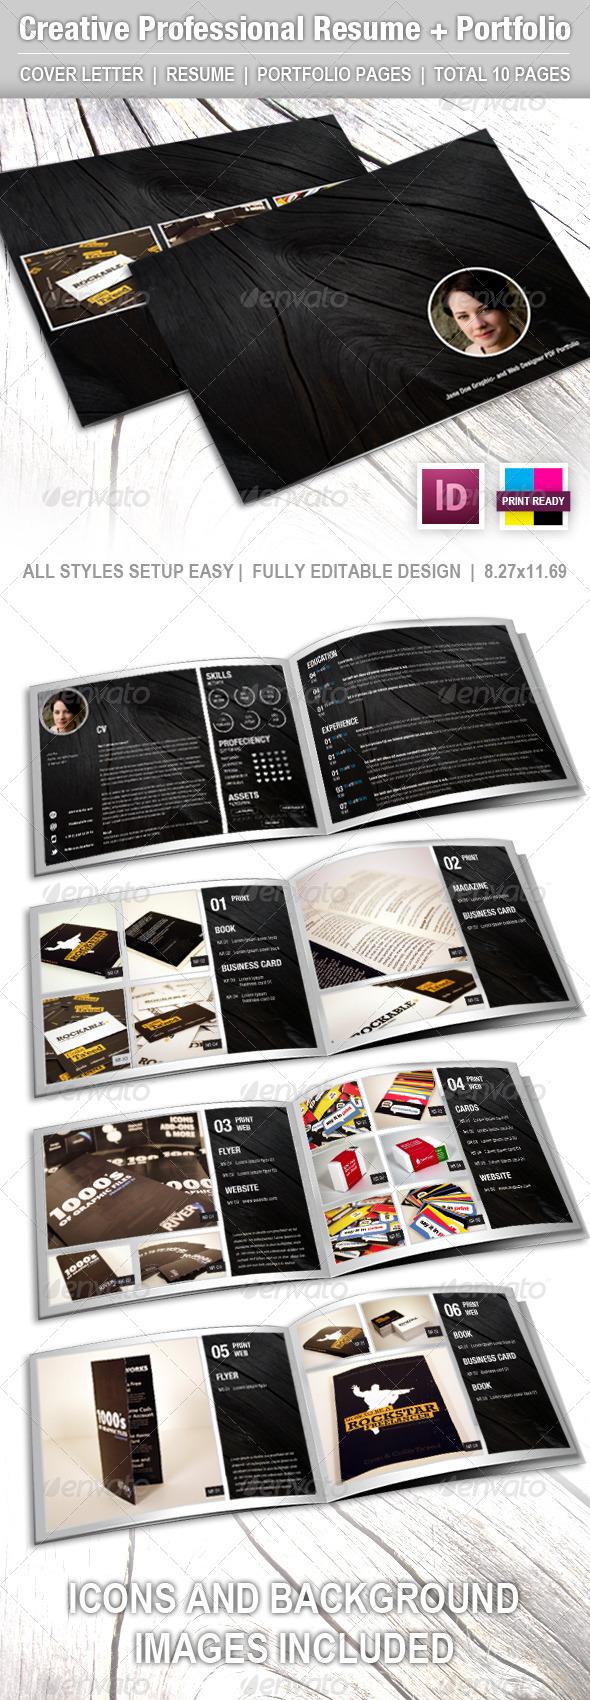 GraphicRiver Creative Professional Resume CV Portfolio 4563419